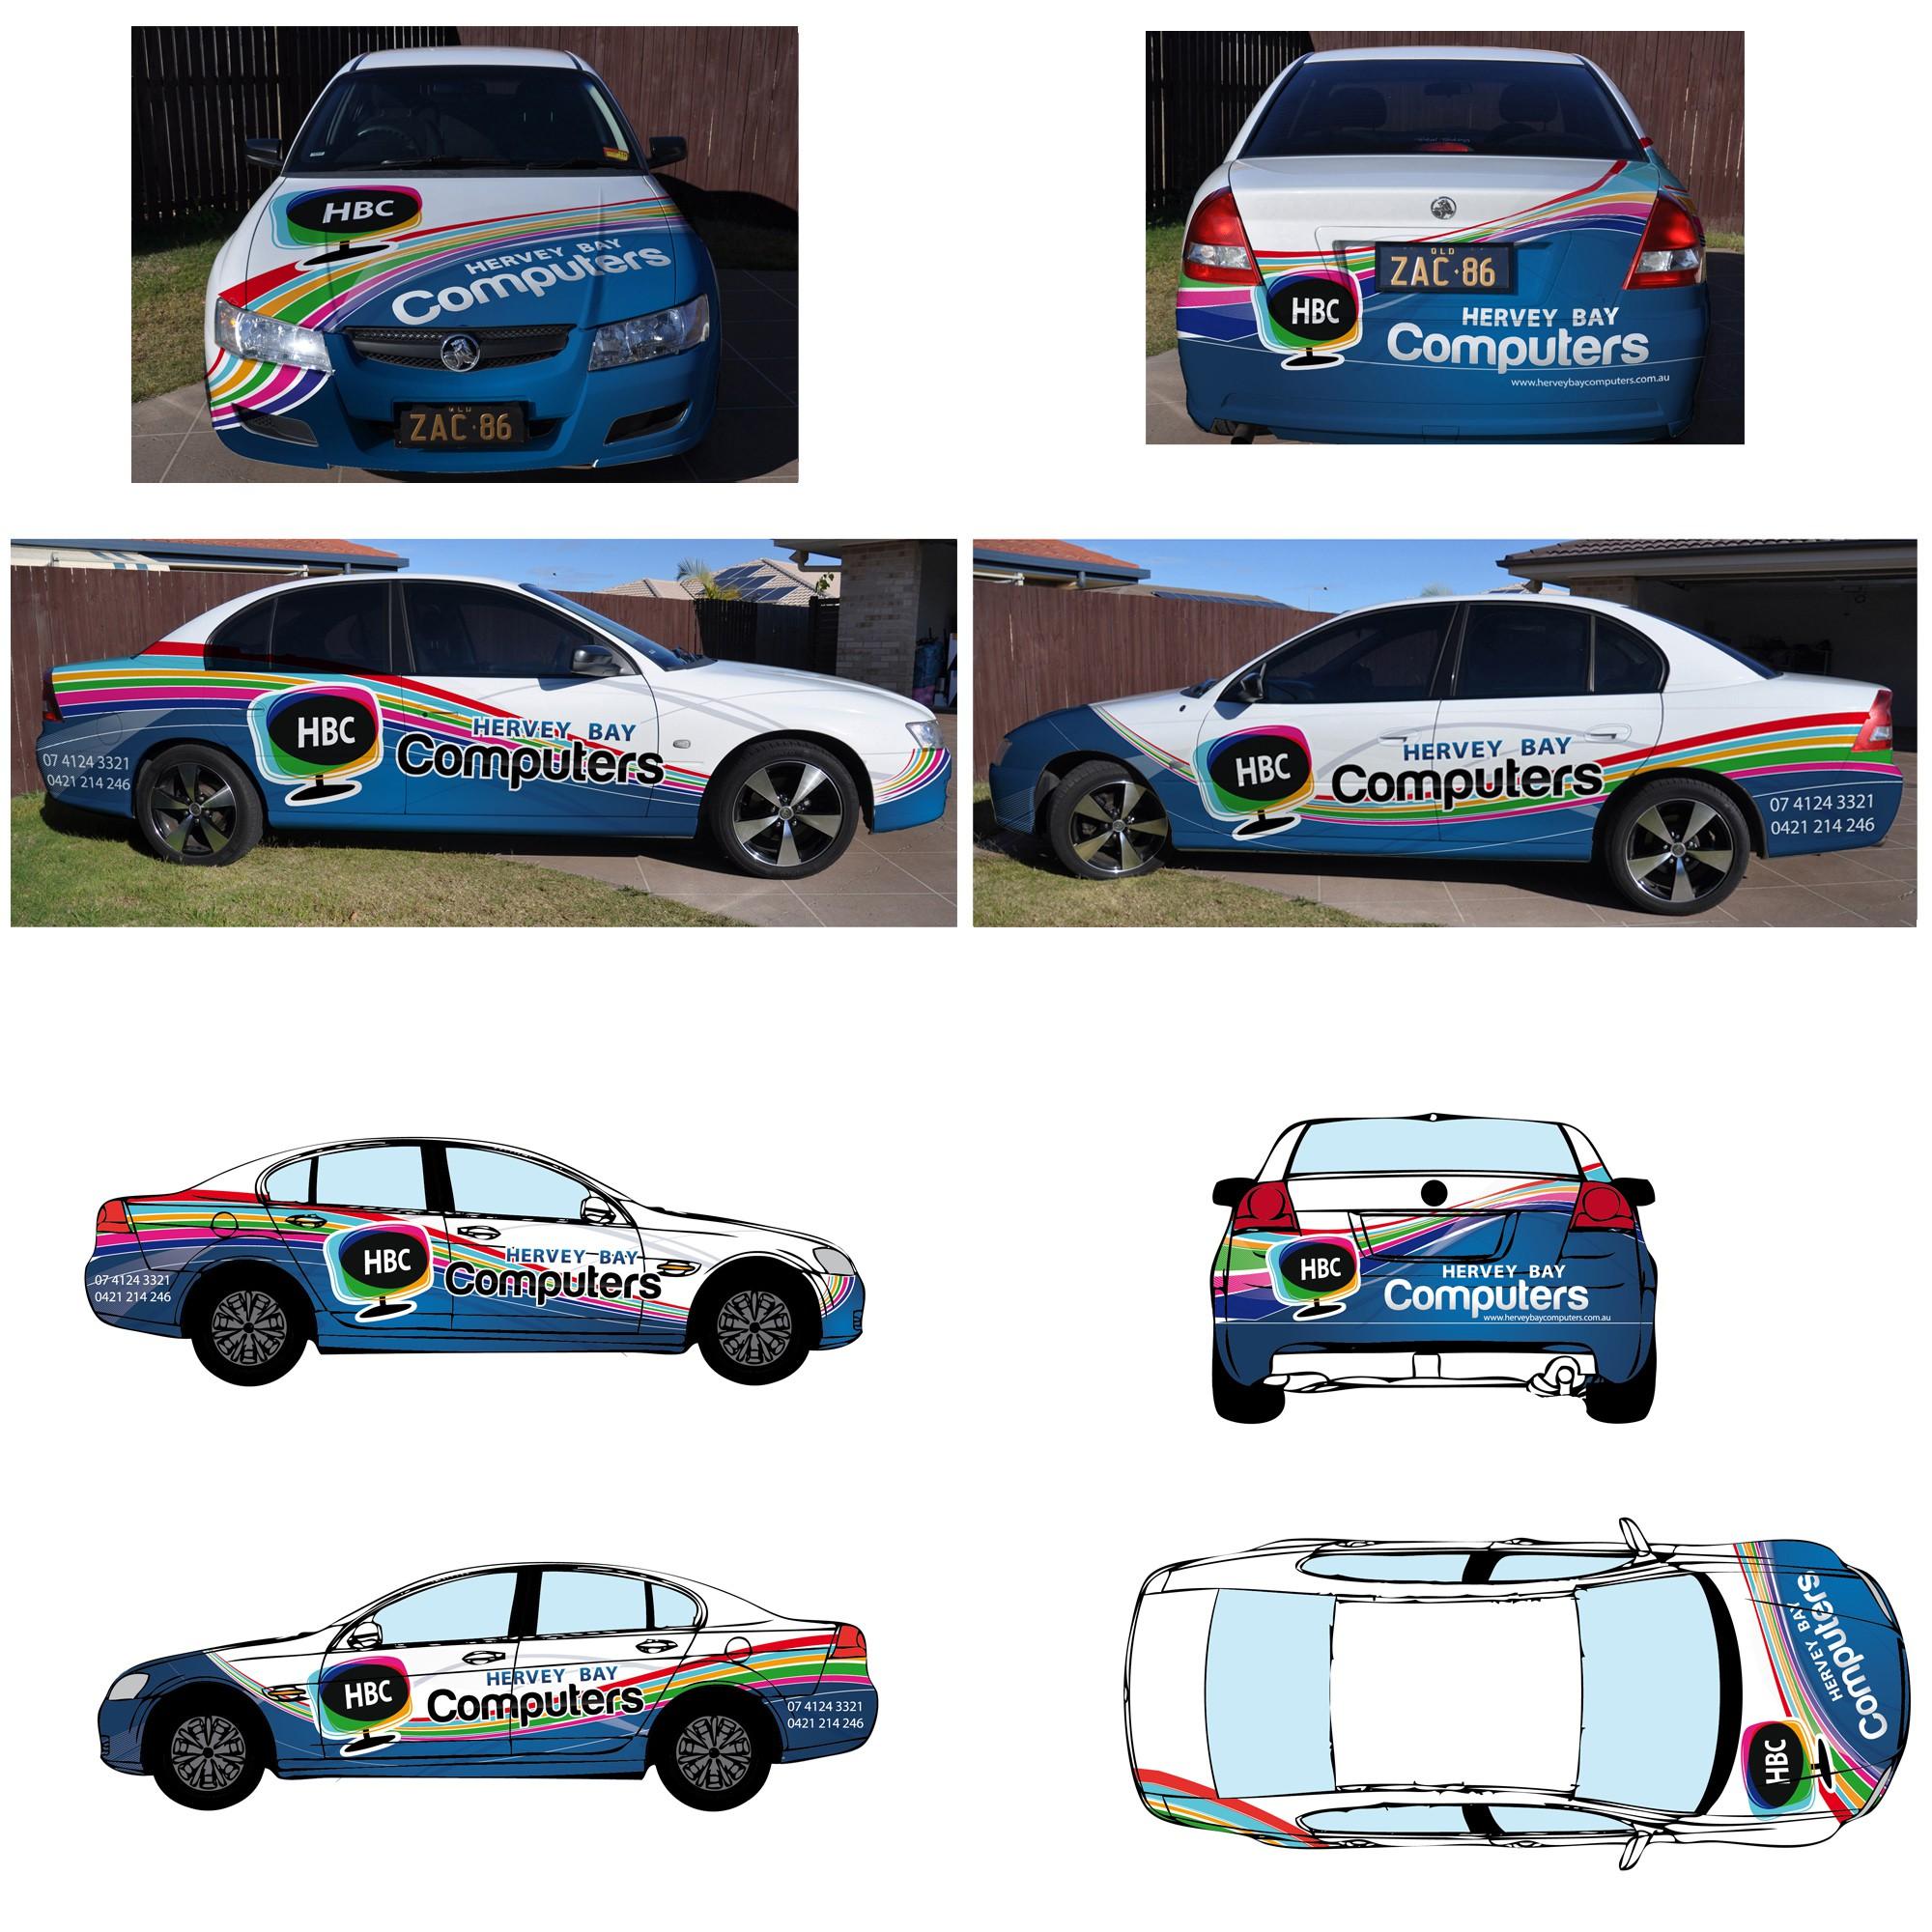 WANTED: Colourful, Eye-catching Car Wrap / Signage